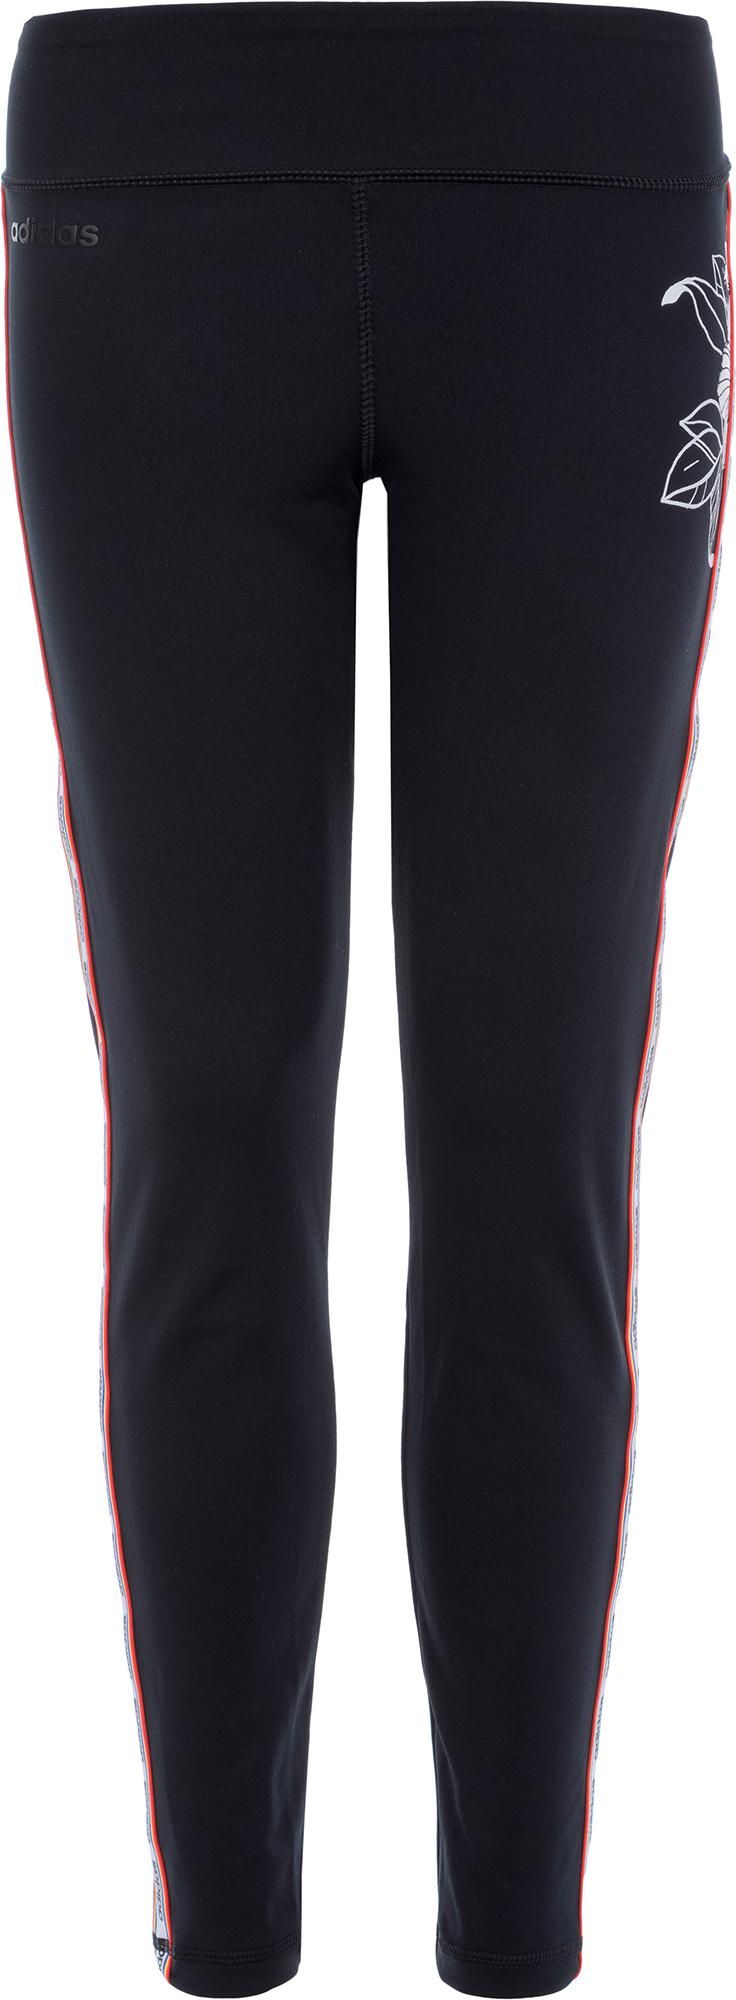 Adidas Легинсы для девочек FARM Rio Cardio, размер 170